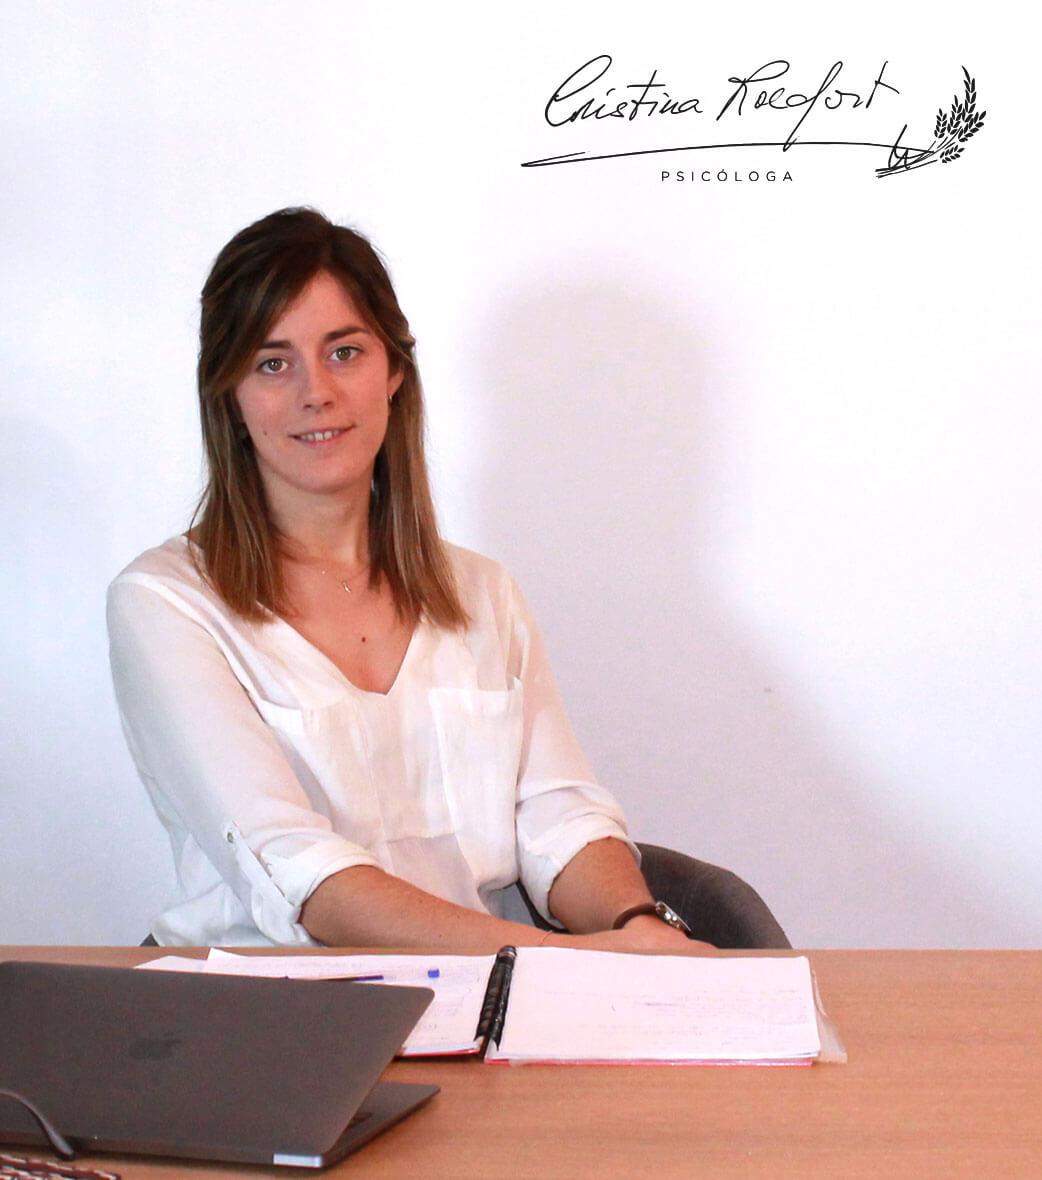 Cristina Rocafort, psicóloga